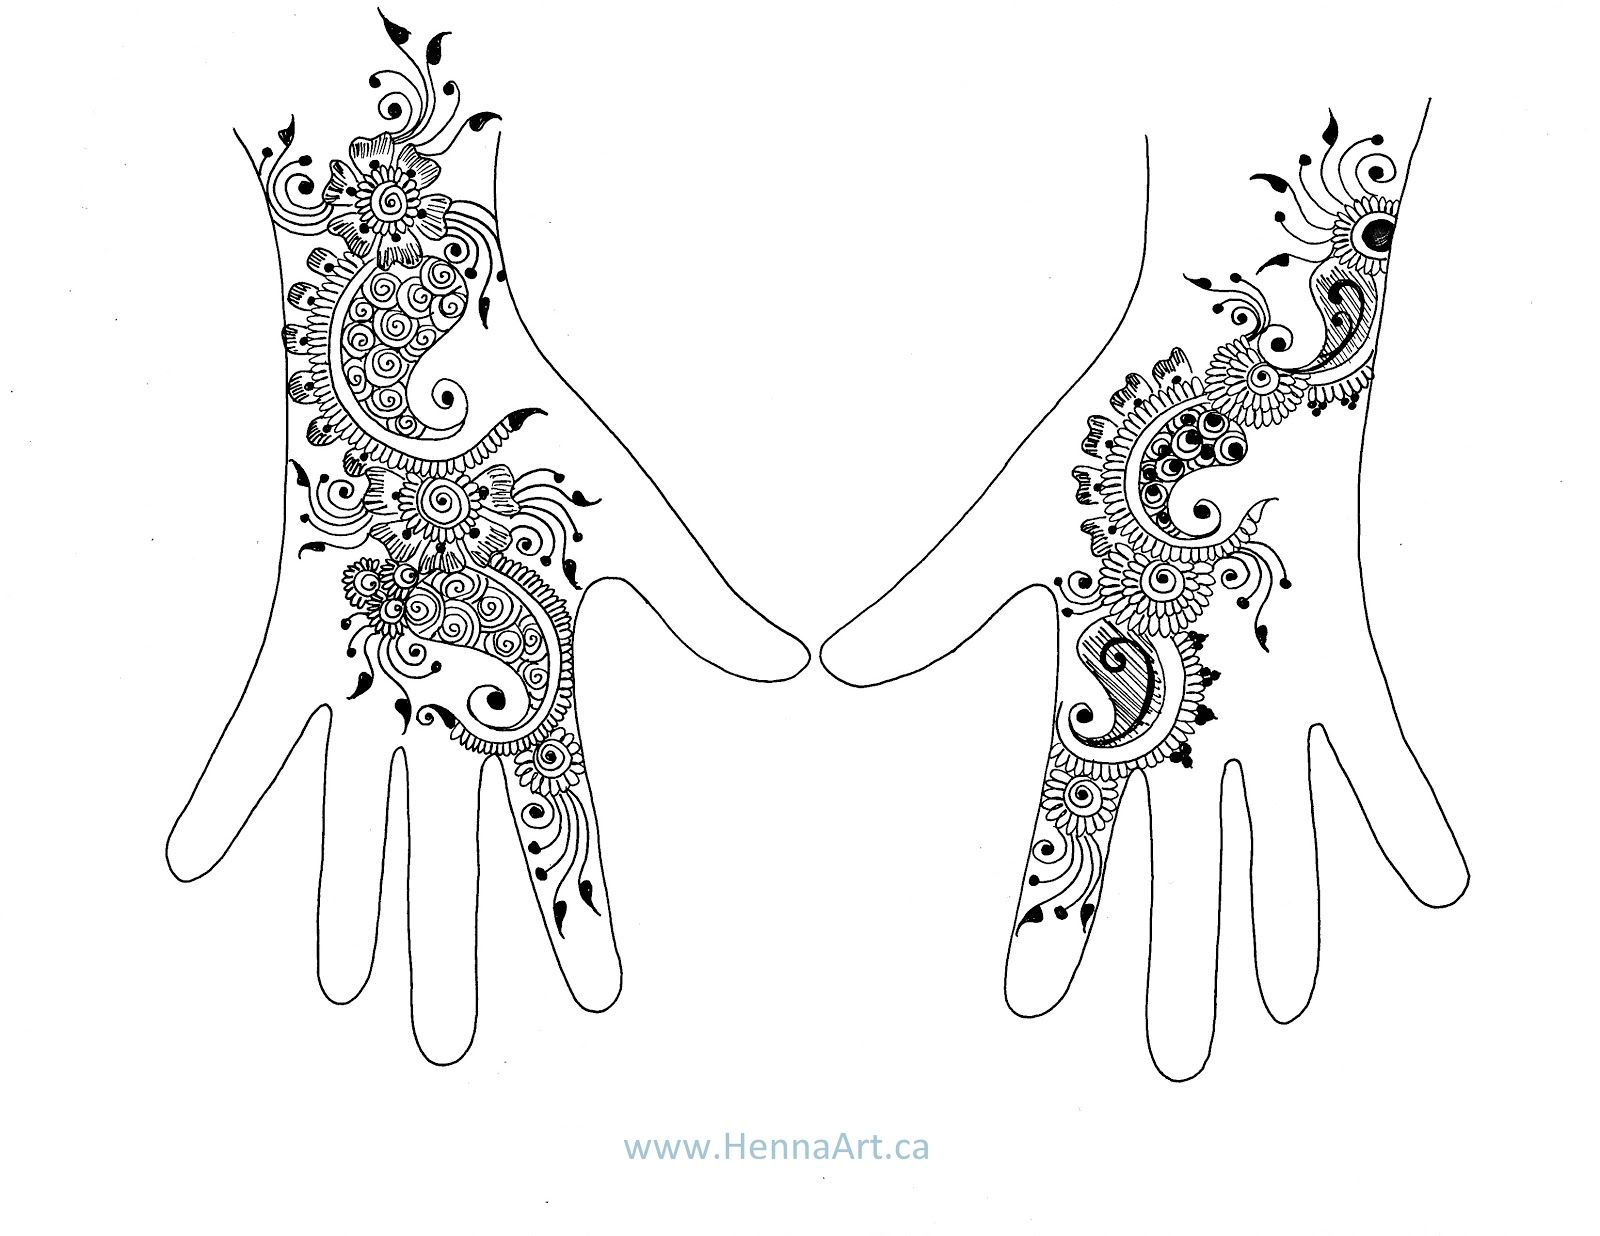 Henna Design Outline: Henna Hand Template - Google Search